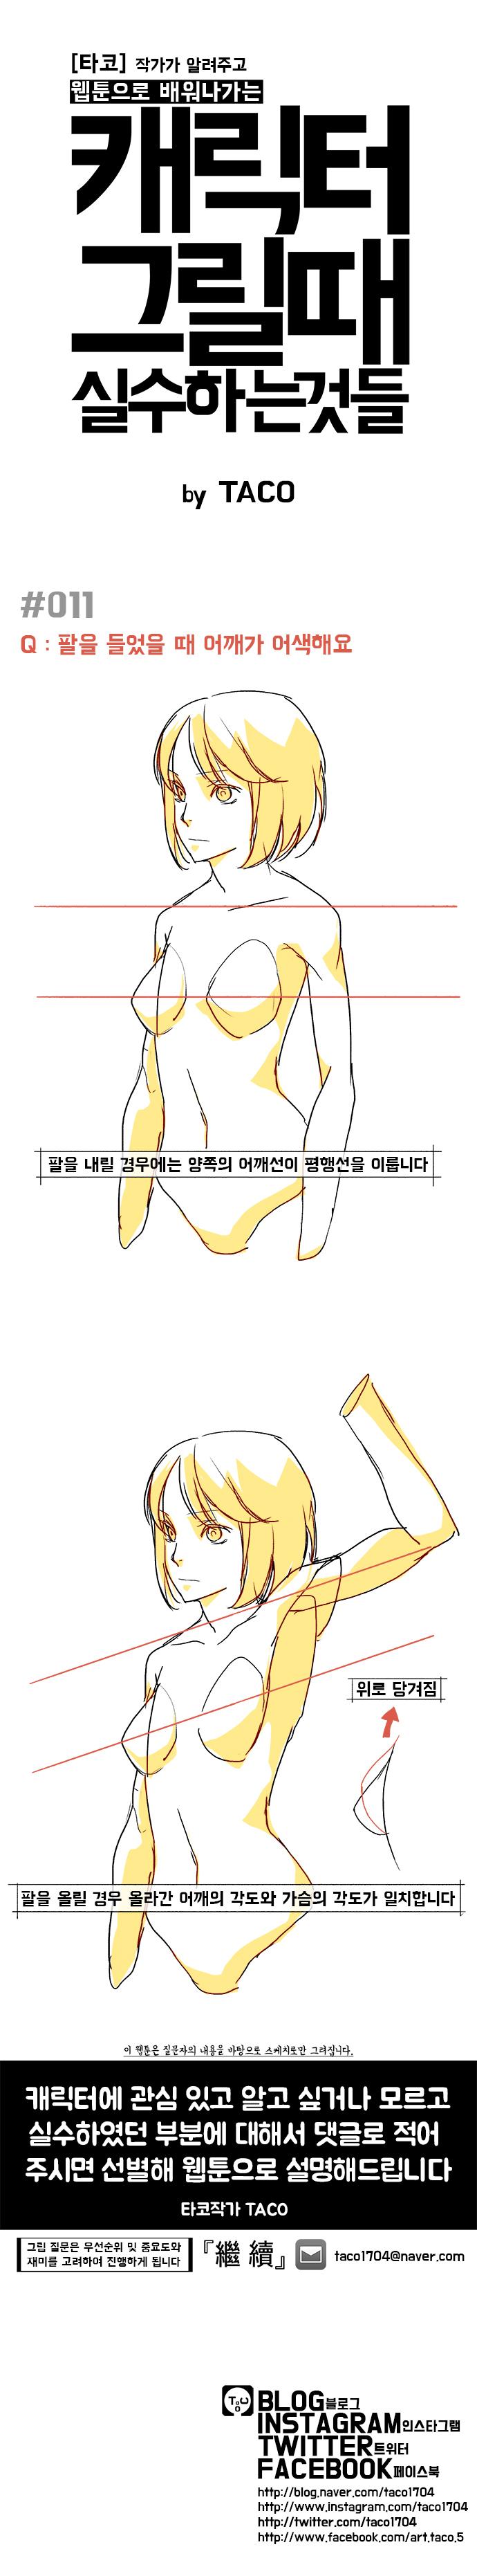 comic content 팔